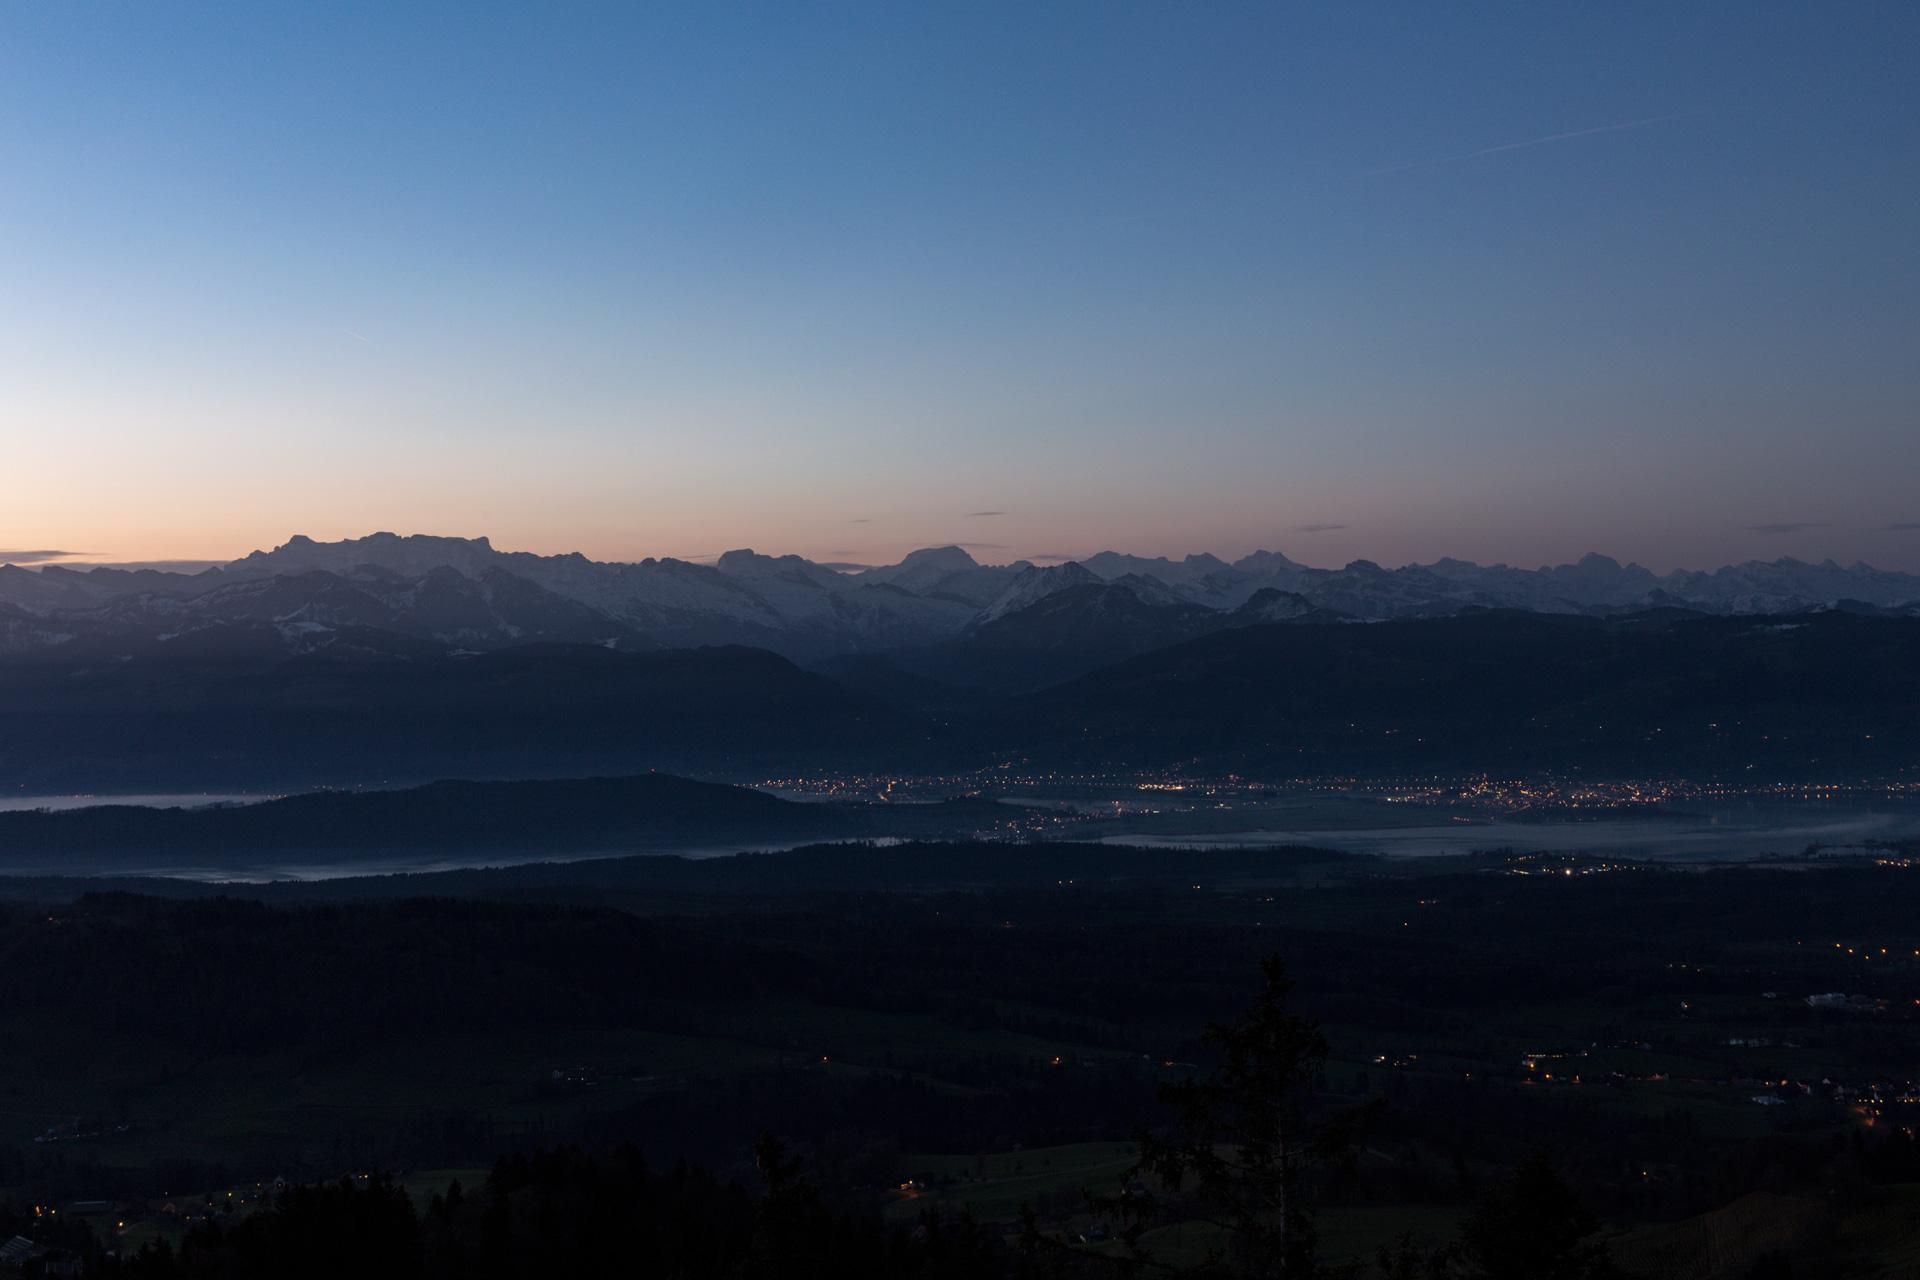 Sonnenaufgang-Bachtelturm_20151219_5842-1